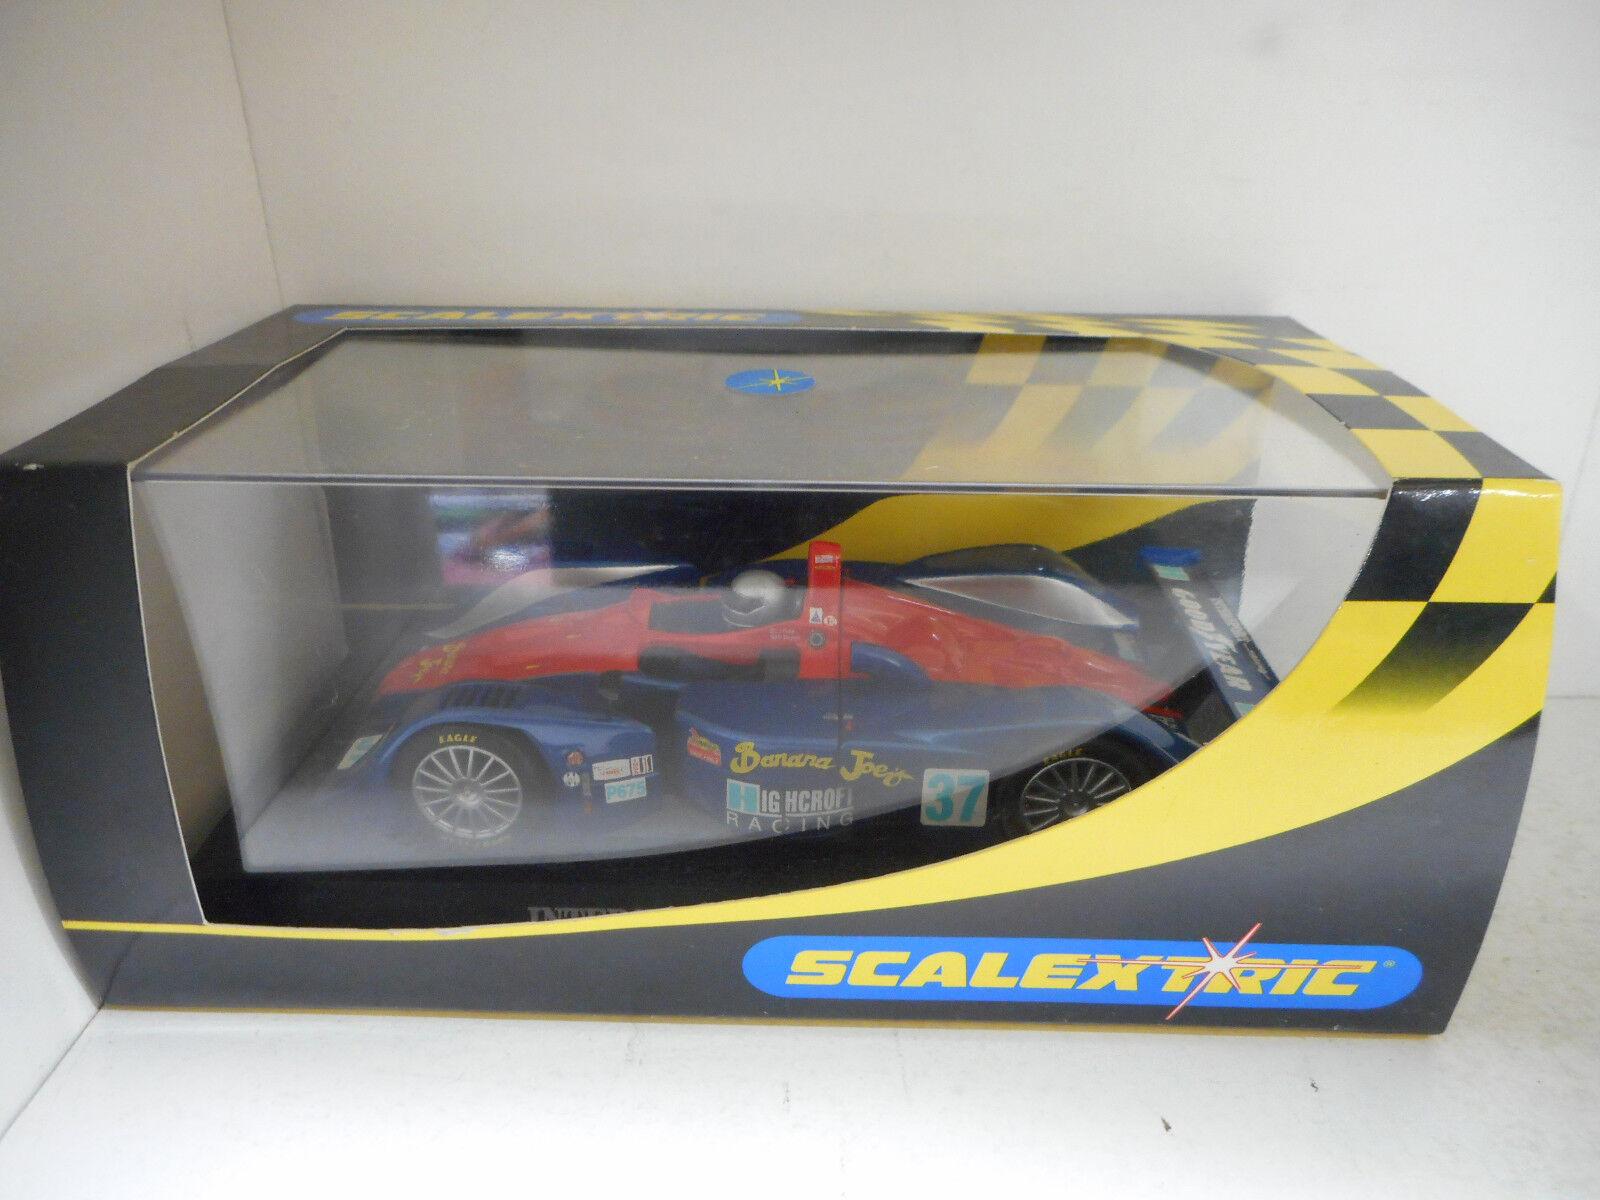 MG LOLA-INTERSPORT RACING-NO 37-C2482--SCX-SCALEXTRIC--SLOT CAR-1 32-27